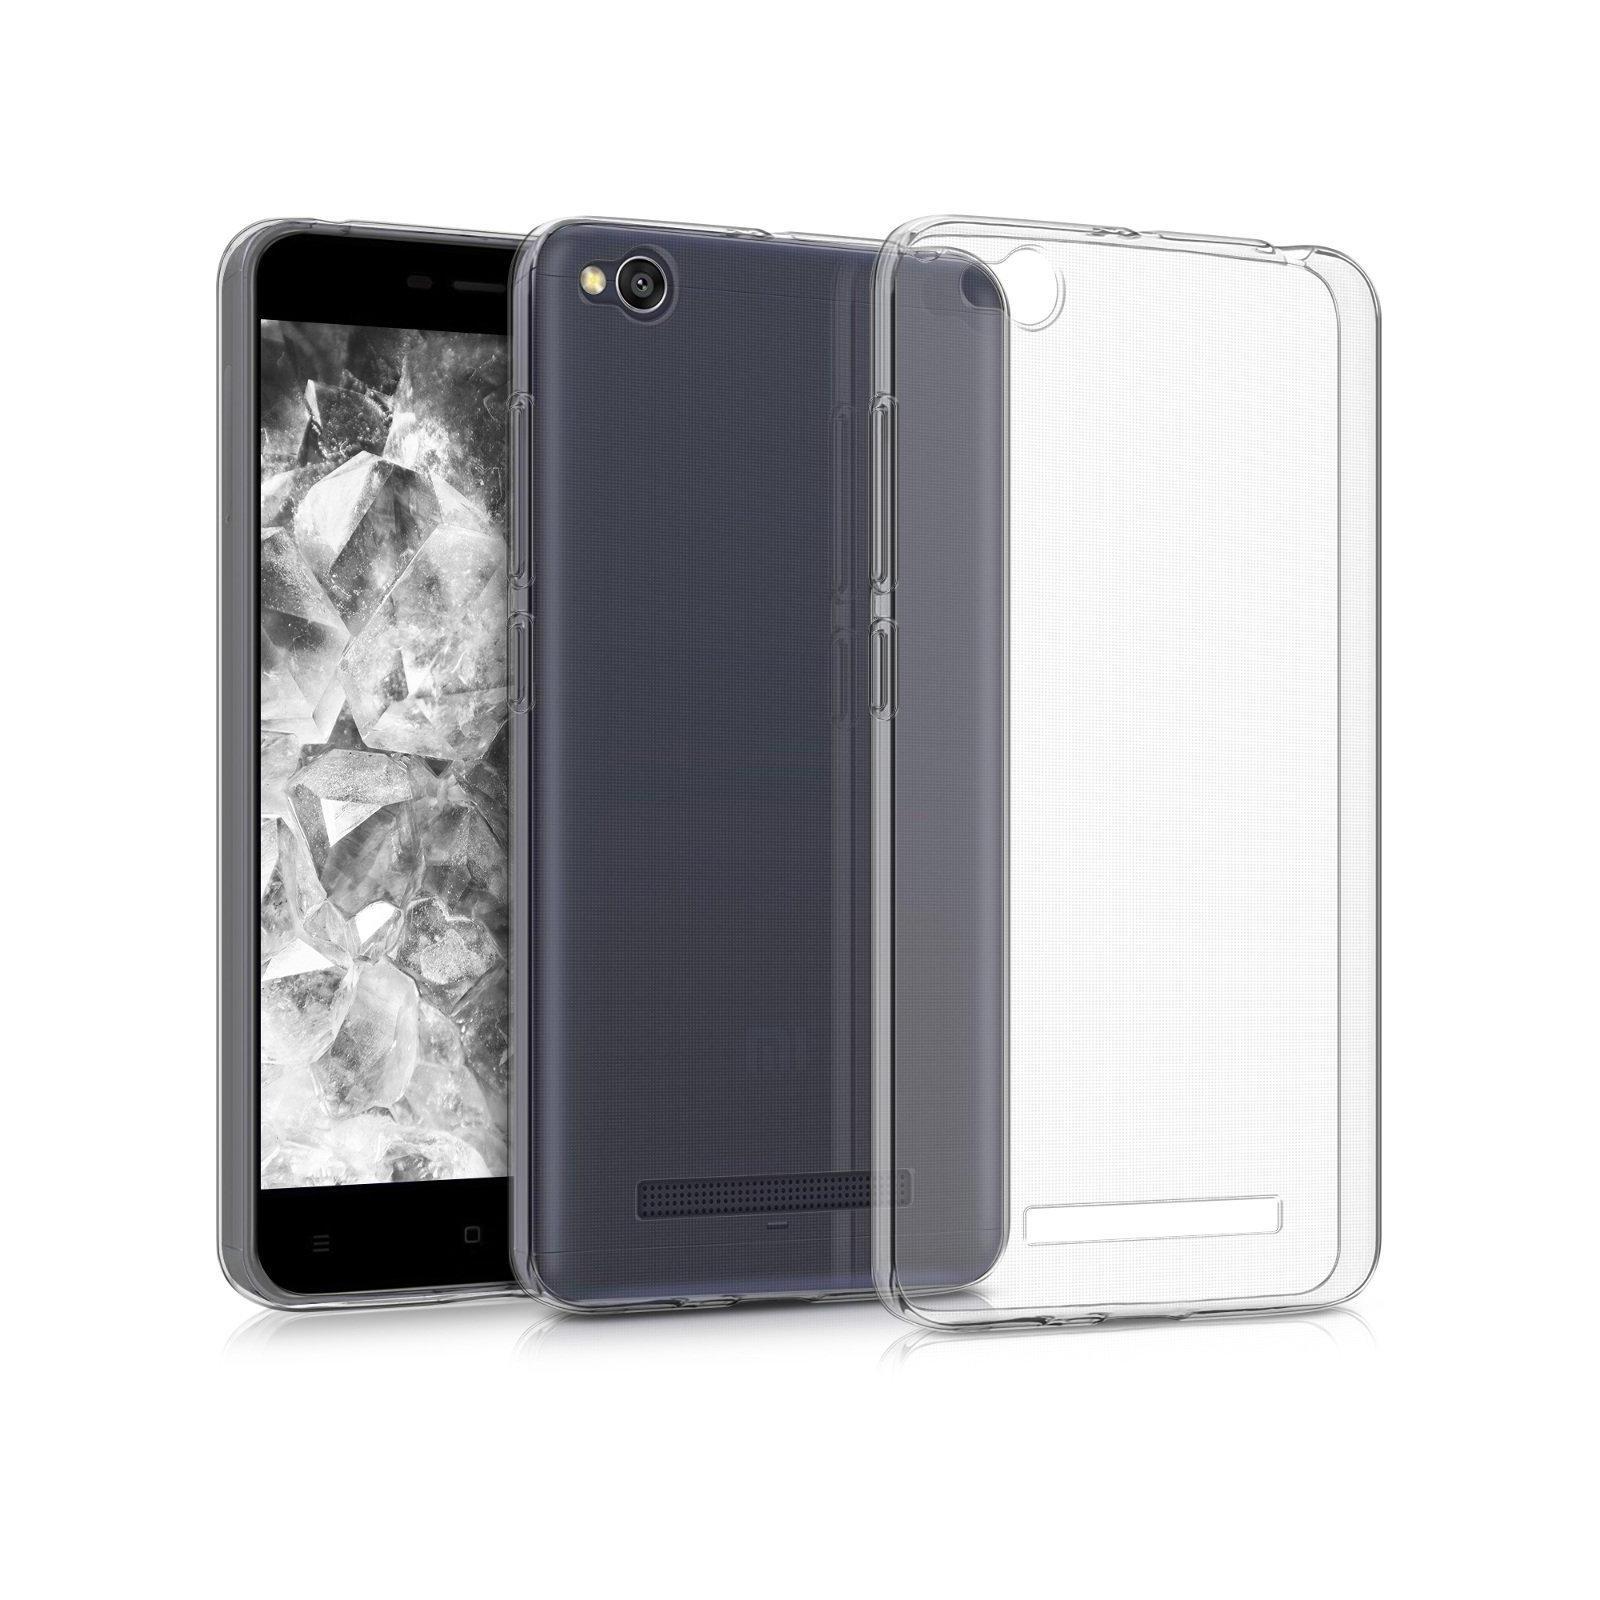 Чехол для моб. телефона Laudtec для Xiaomi Redmi 5A Clear tpu (Transperent) (LC-XR5A) изображение 5